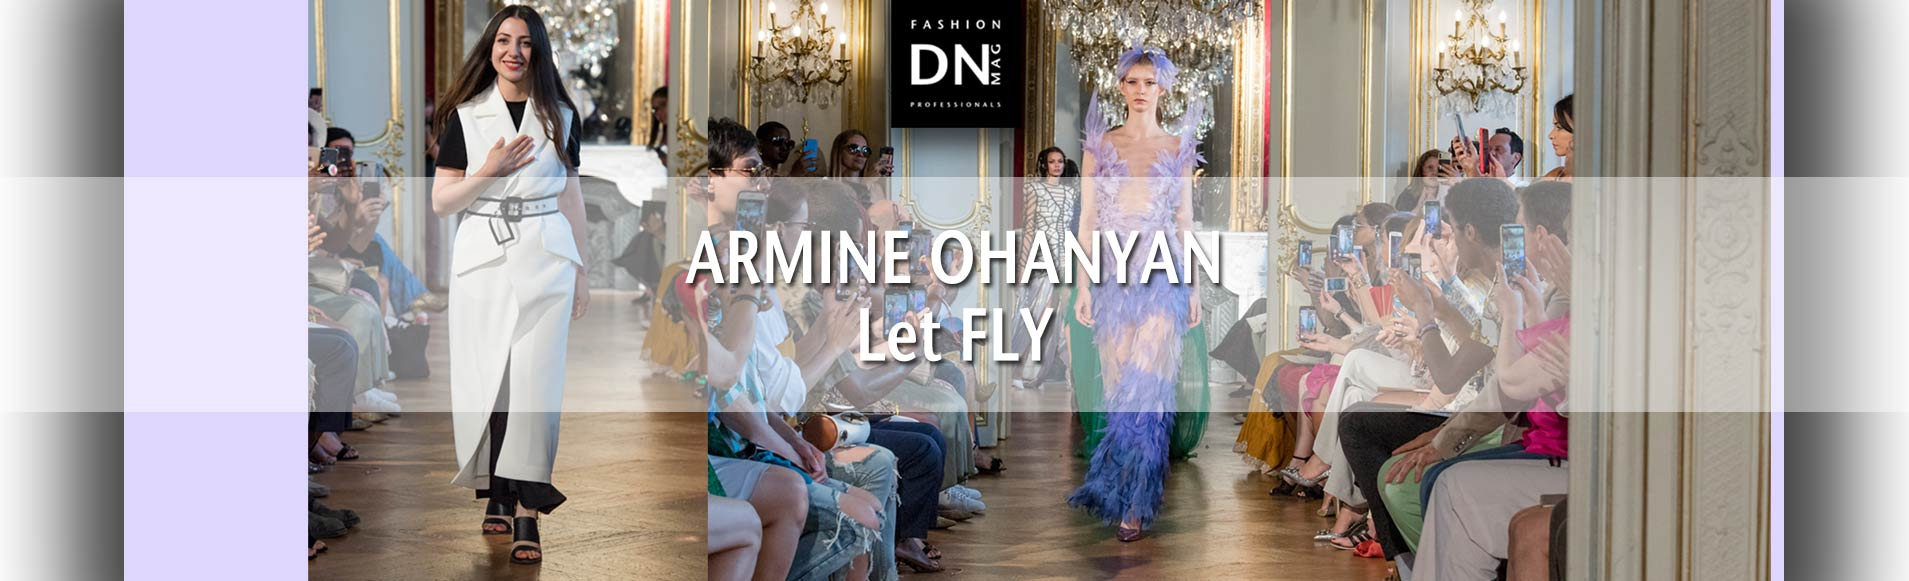 ARMINE OHANYAN FALL-WINTER-2019/20 - DNMAG Fashion Professionals